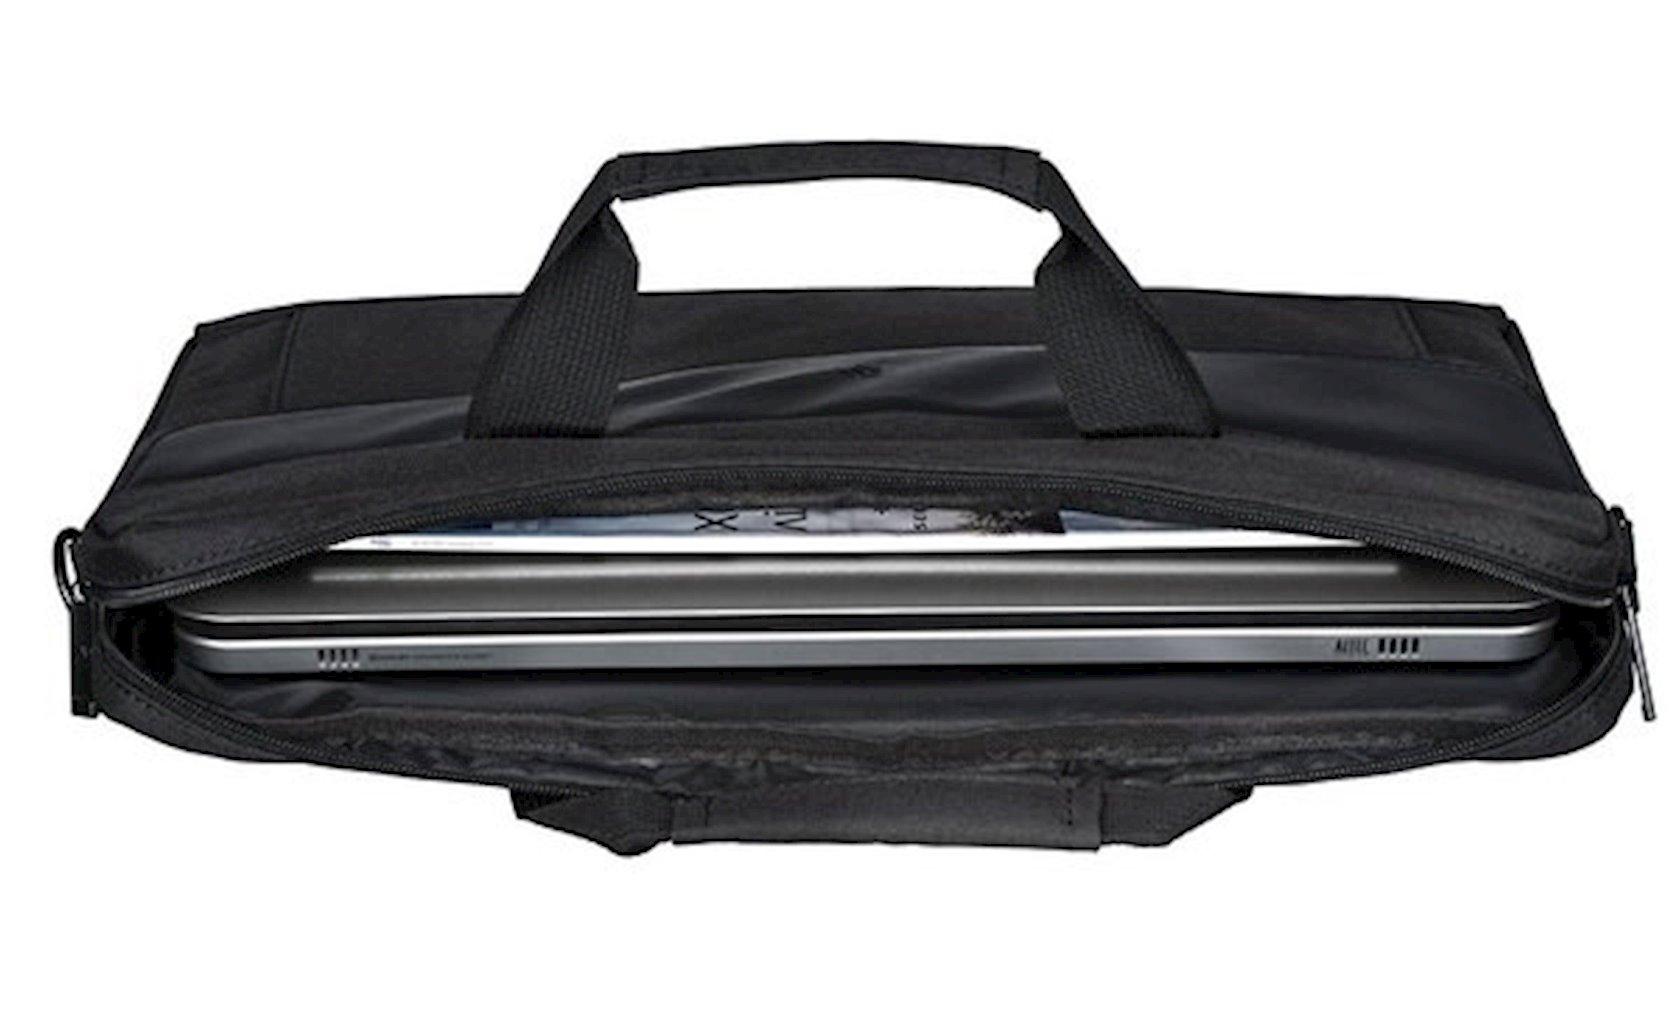 Çanta noutbuk üçün 2E Laptop Bag, Fashion 16, Black